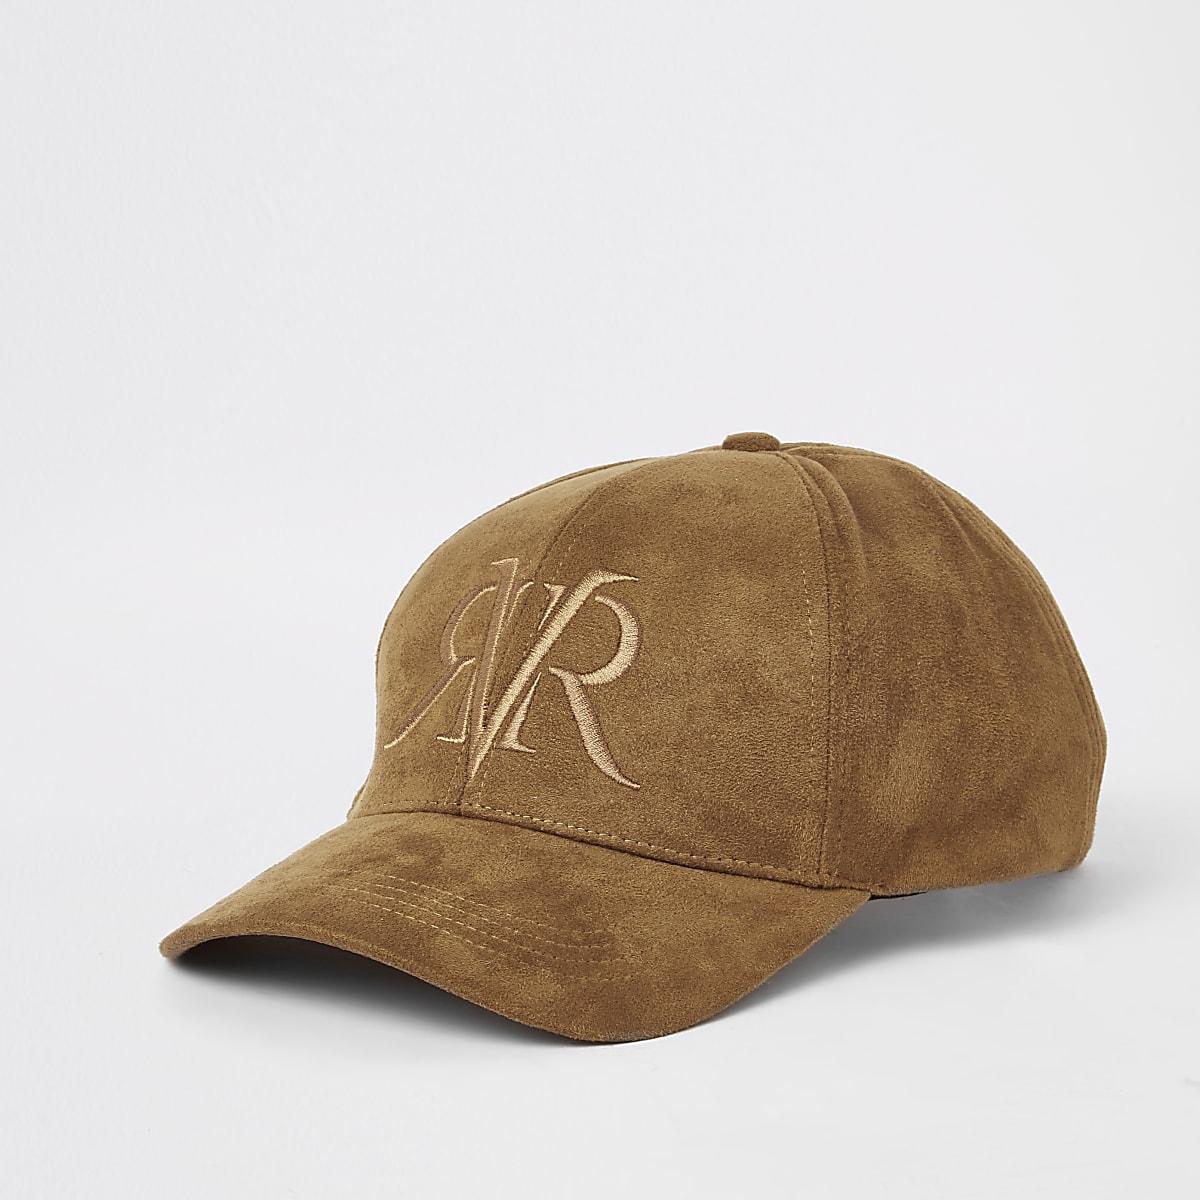 Brown 'RVR'  faux suede cap